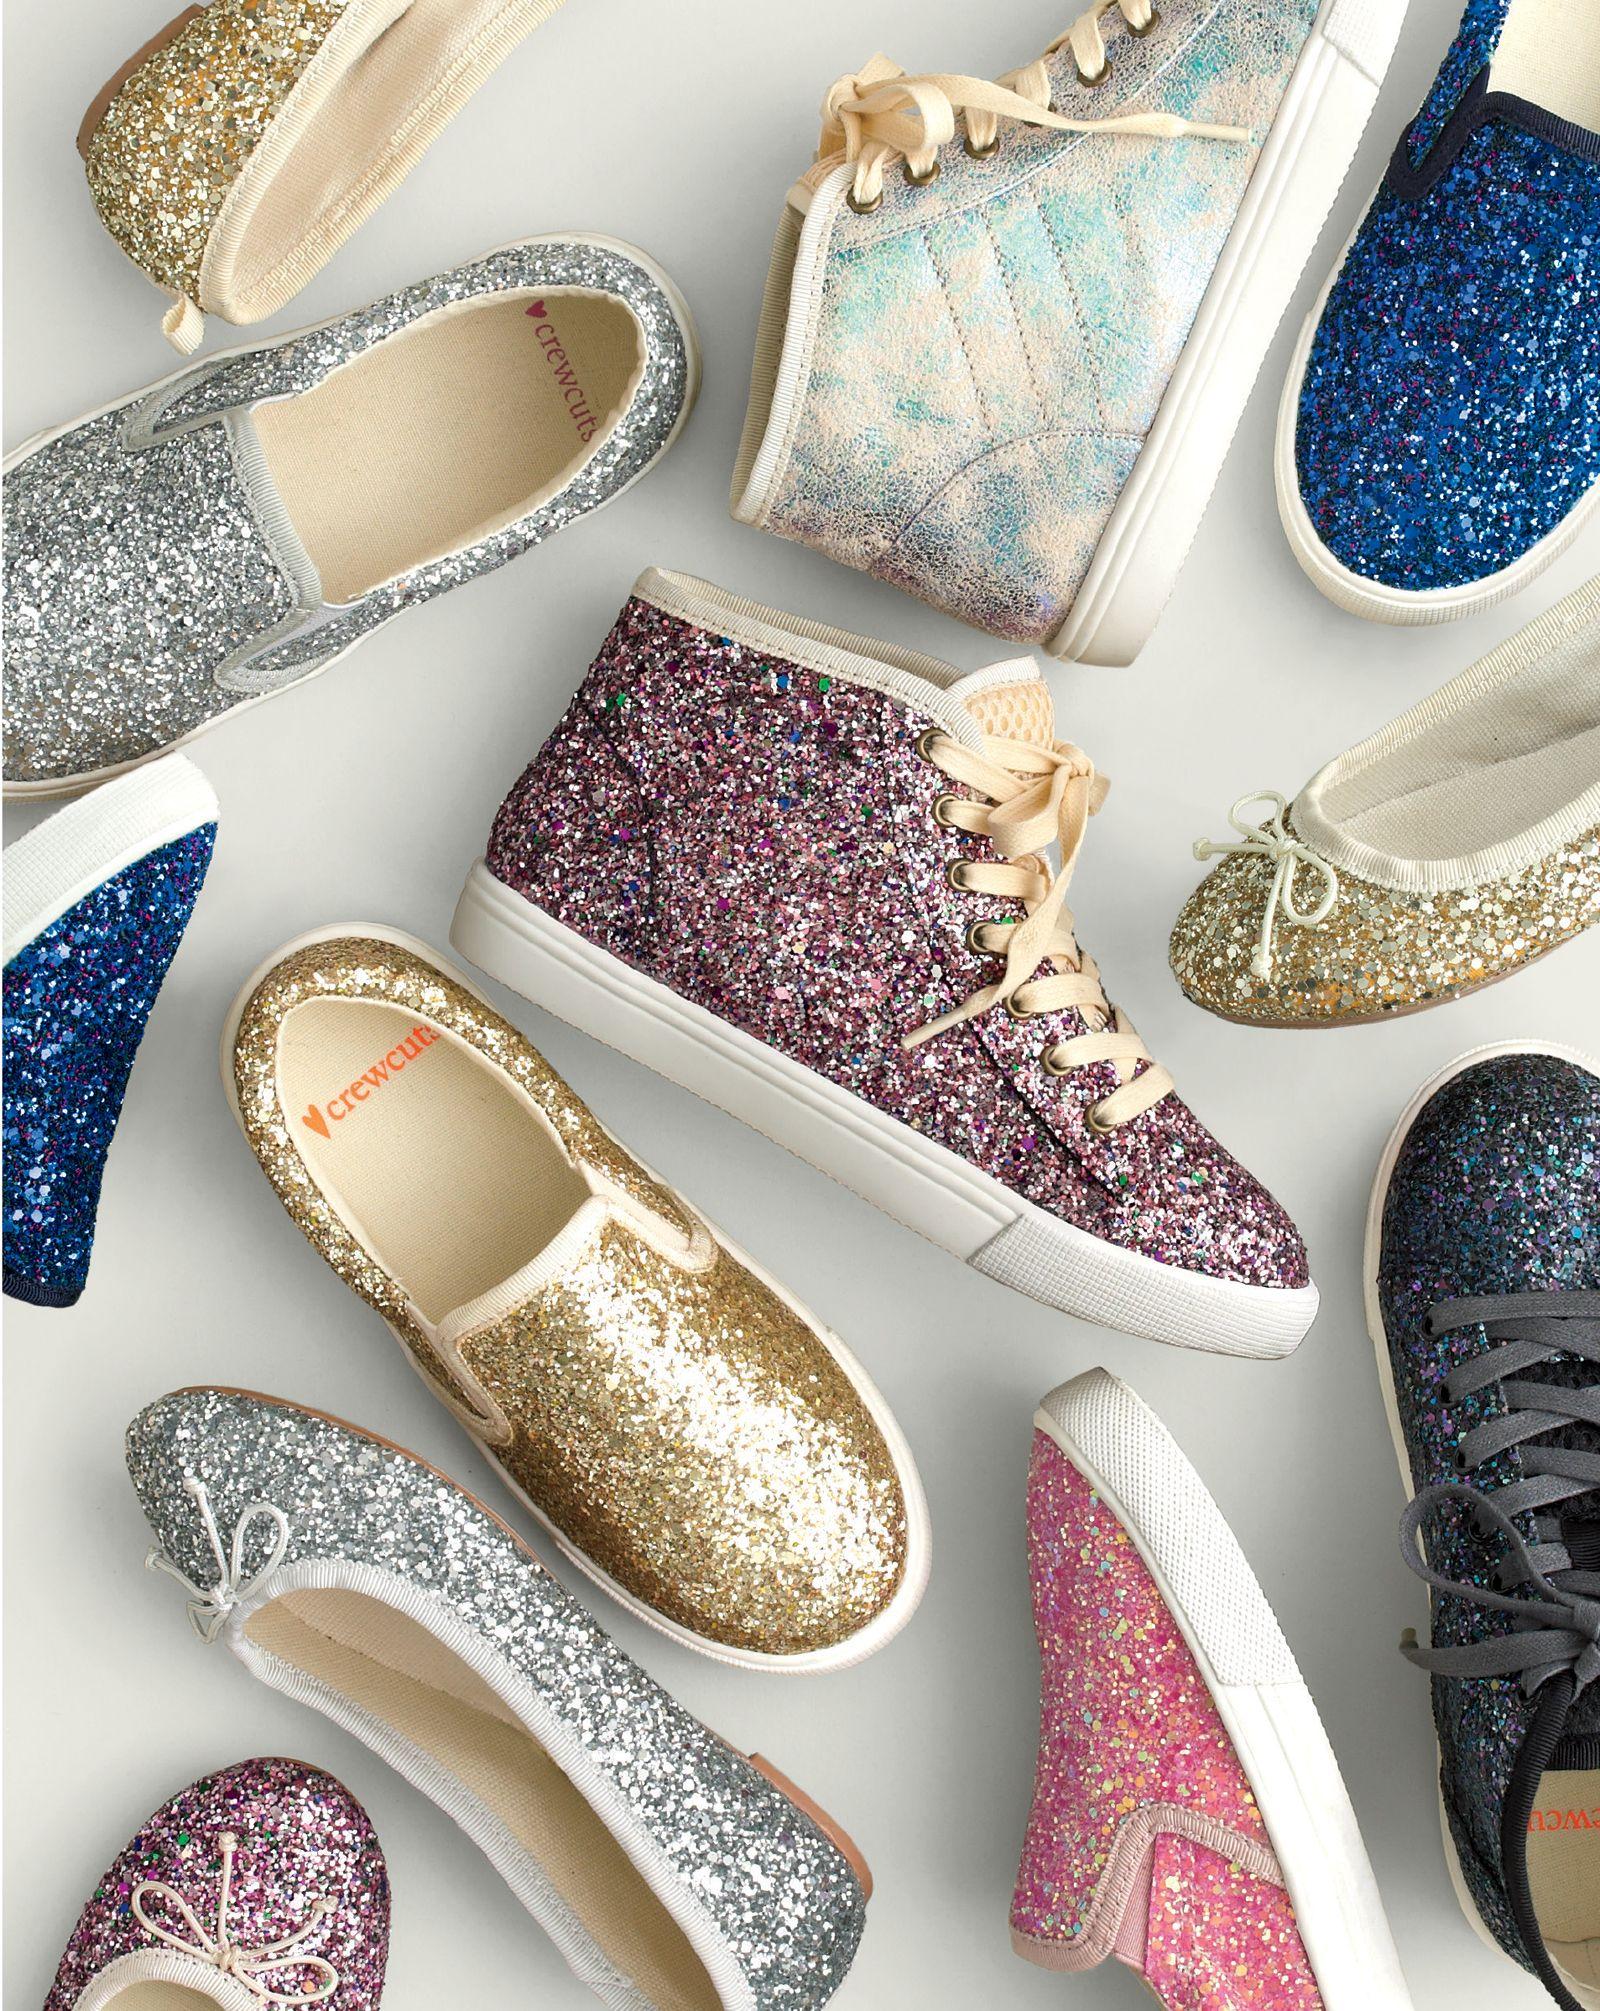 6855260a2 J.Crew girls' slide sneaker in glitter, iridescent high-top sneaker,  high-top sneaker in glitter and ballet flats in classic glitter.